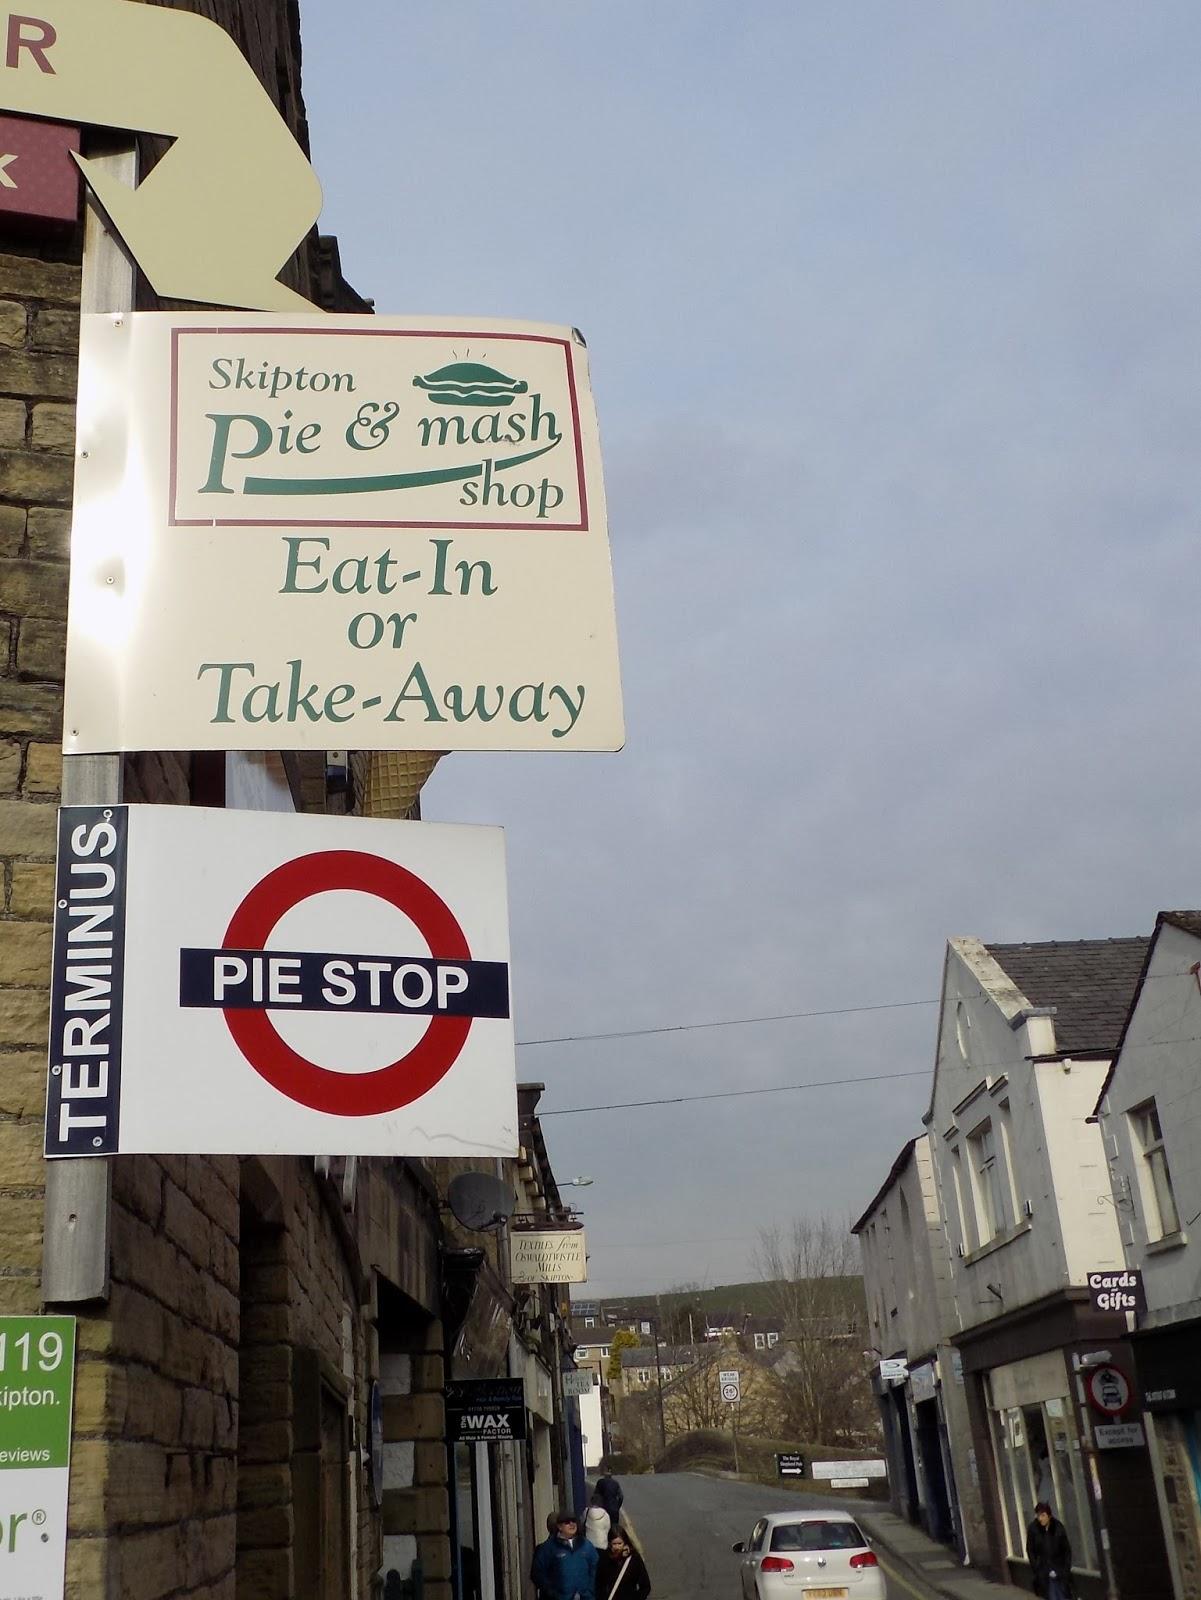 Skipton pie and mash shop